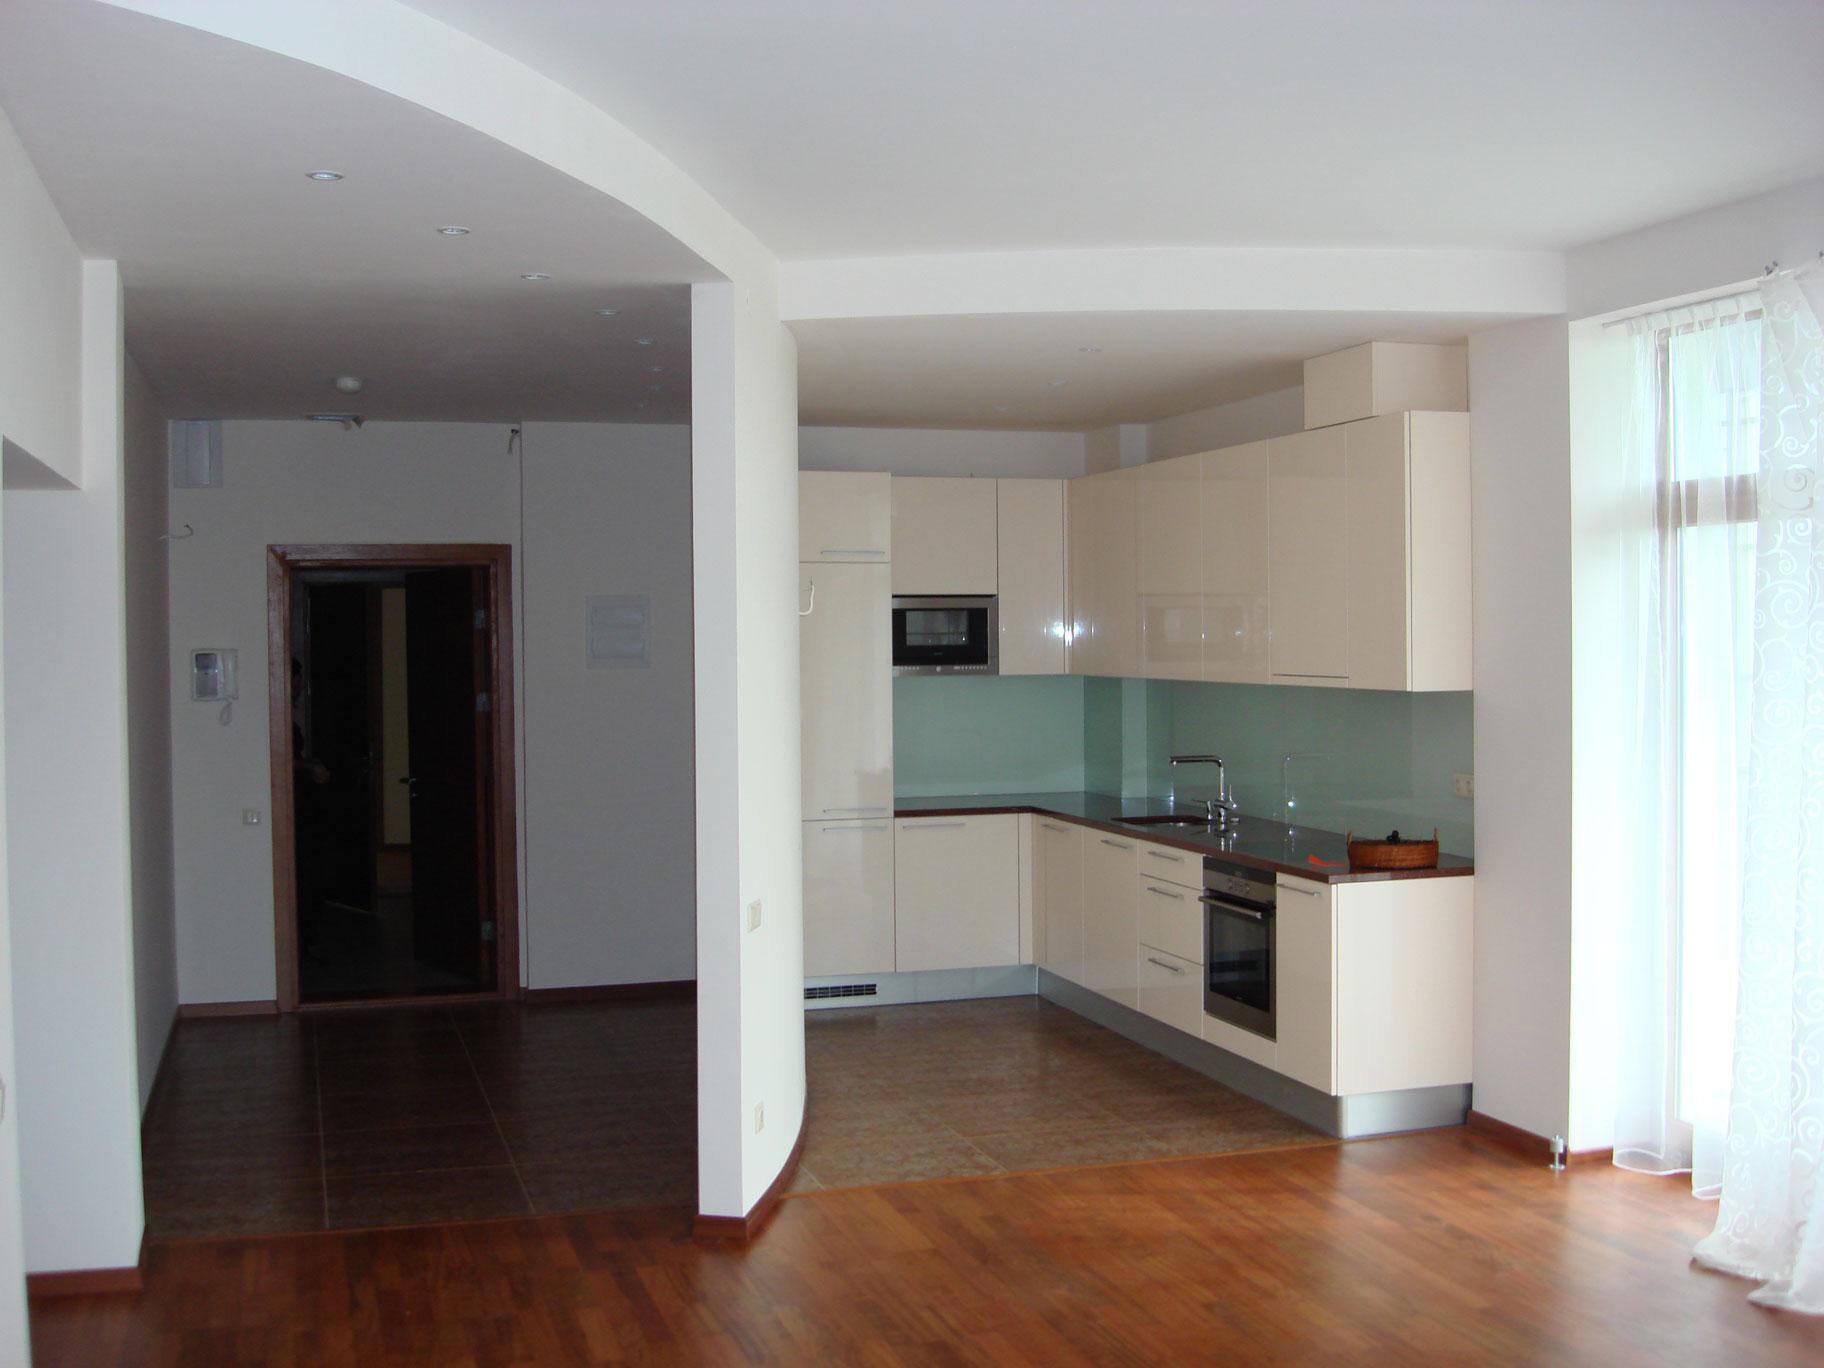 Отделка квартир: http://neorealty.ru/rebase/latvia/1220183874.obj/1220185238.obj/